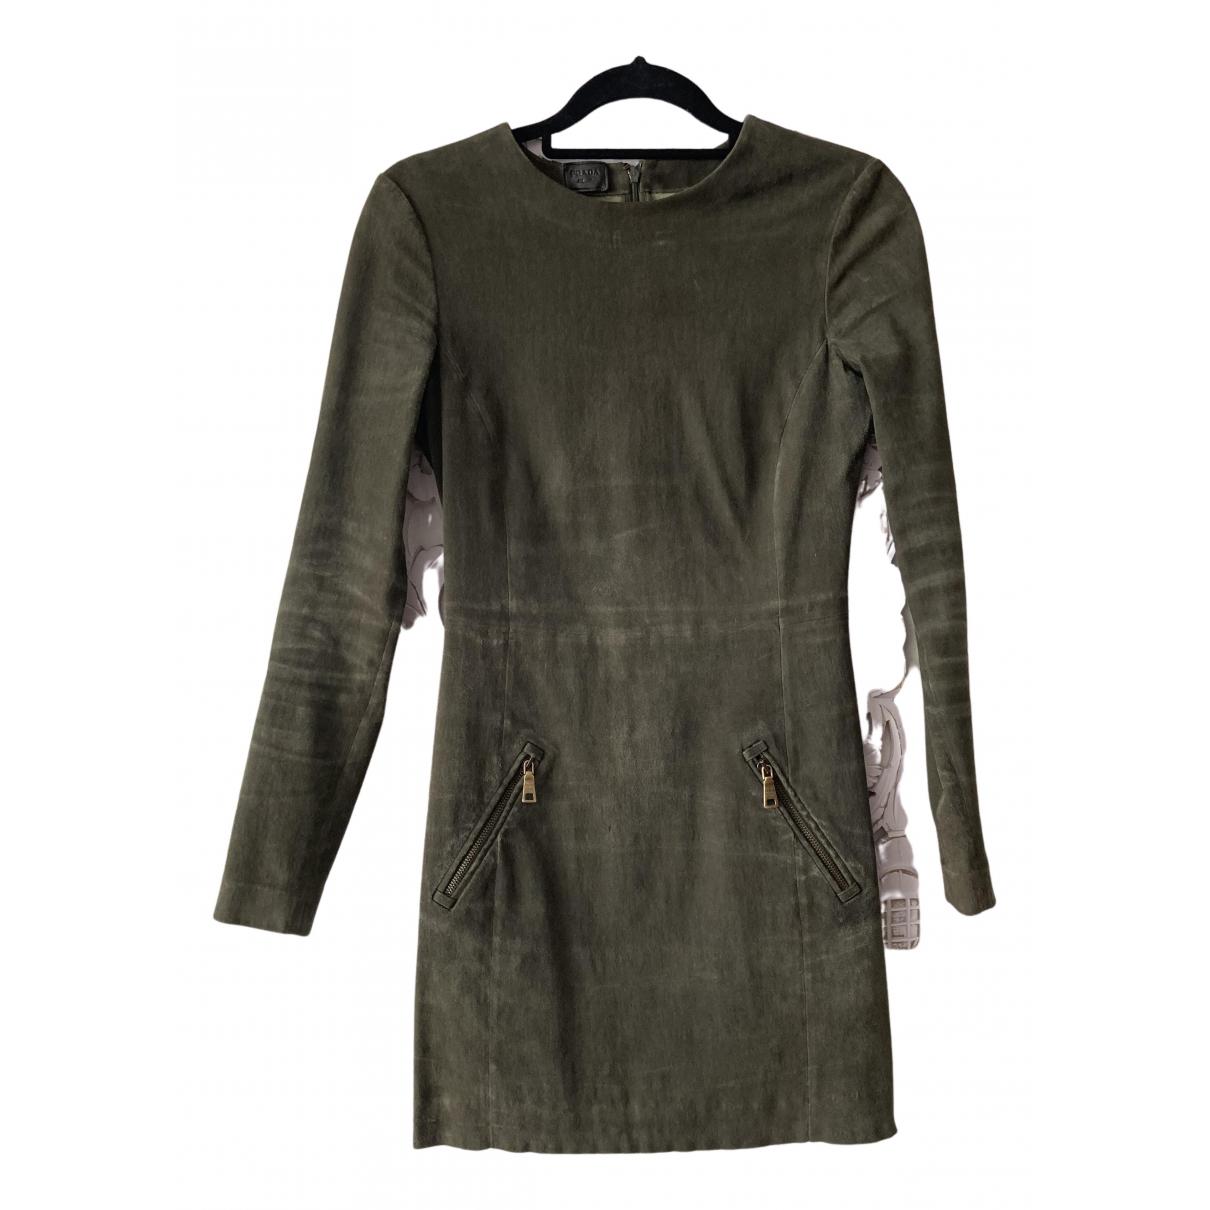 Prada N Khaki Suede dress for Women 42 IT